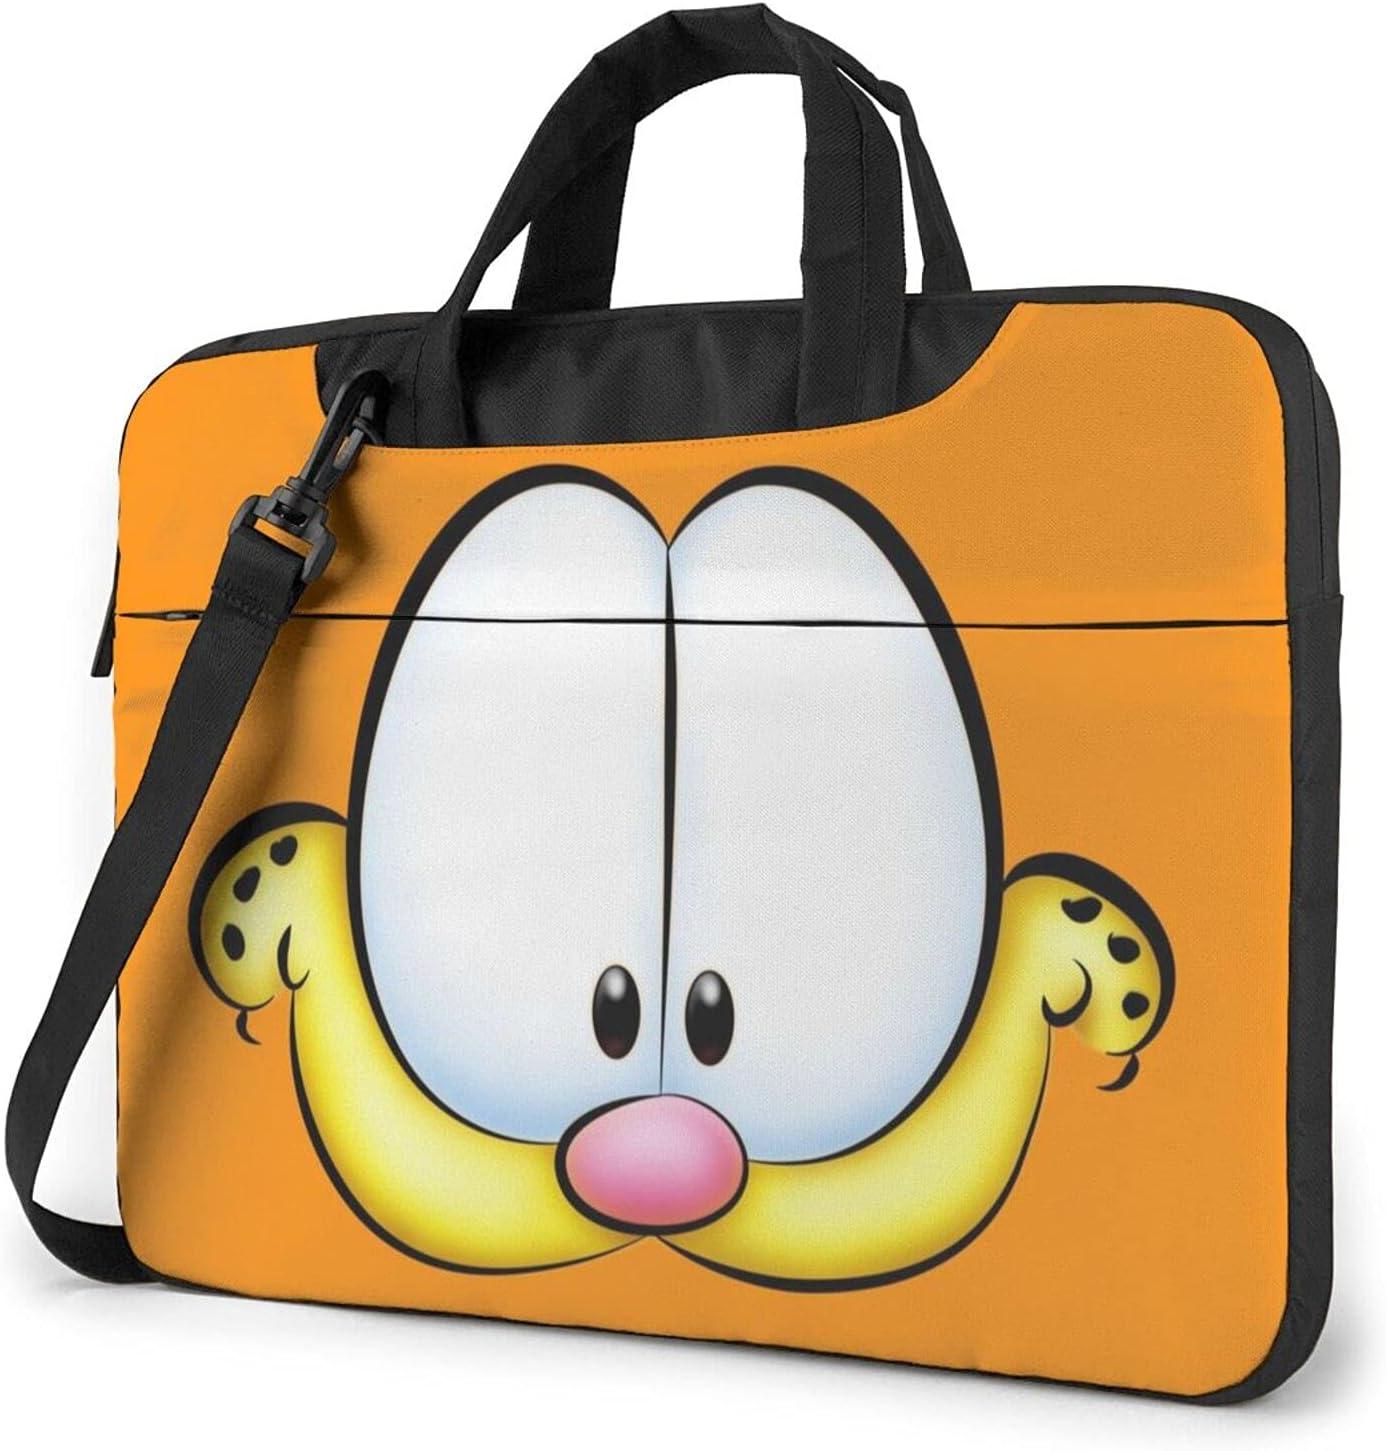 Laptop Sleeve Bag Case 15.6 B depot Nippon regular agency Notebook Portable inch